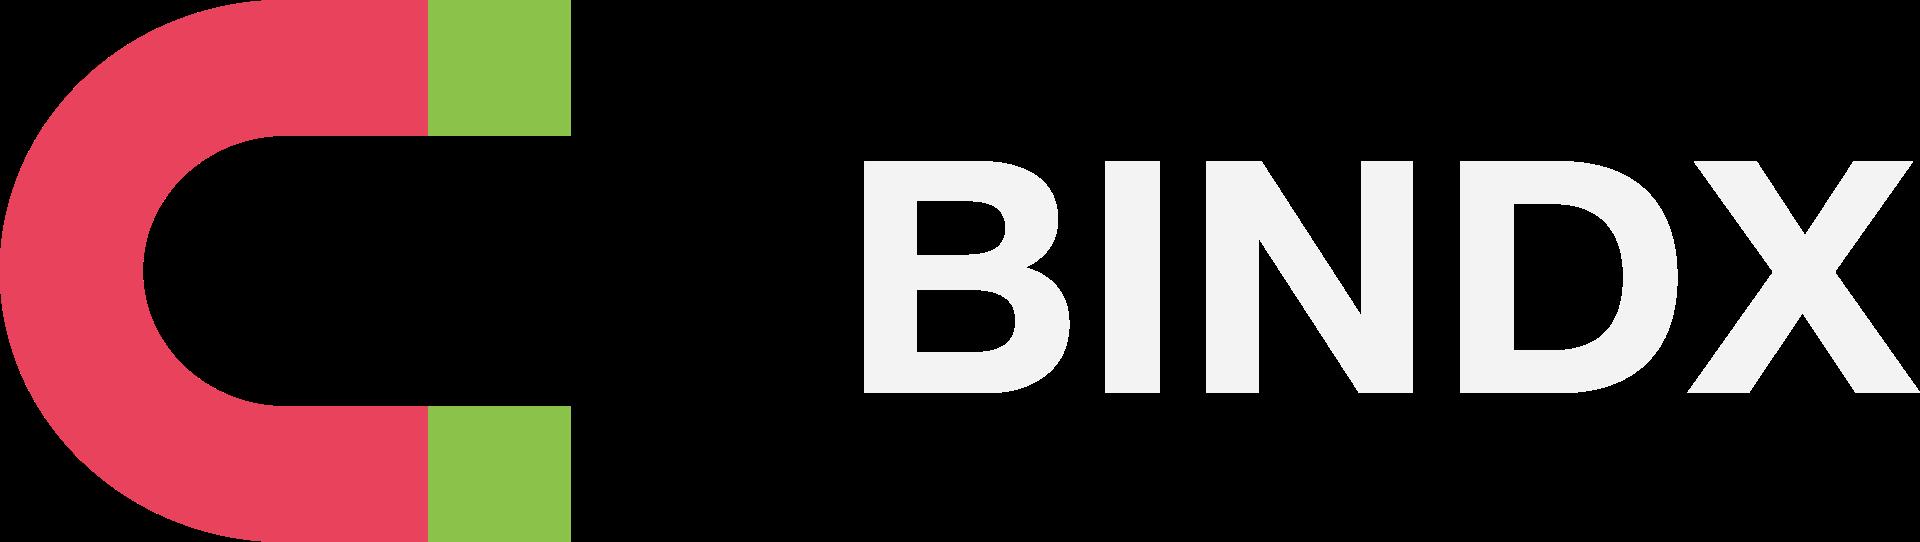 BINDX.Pro